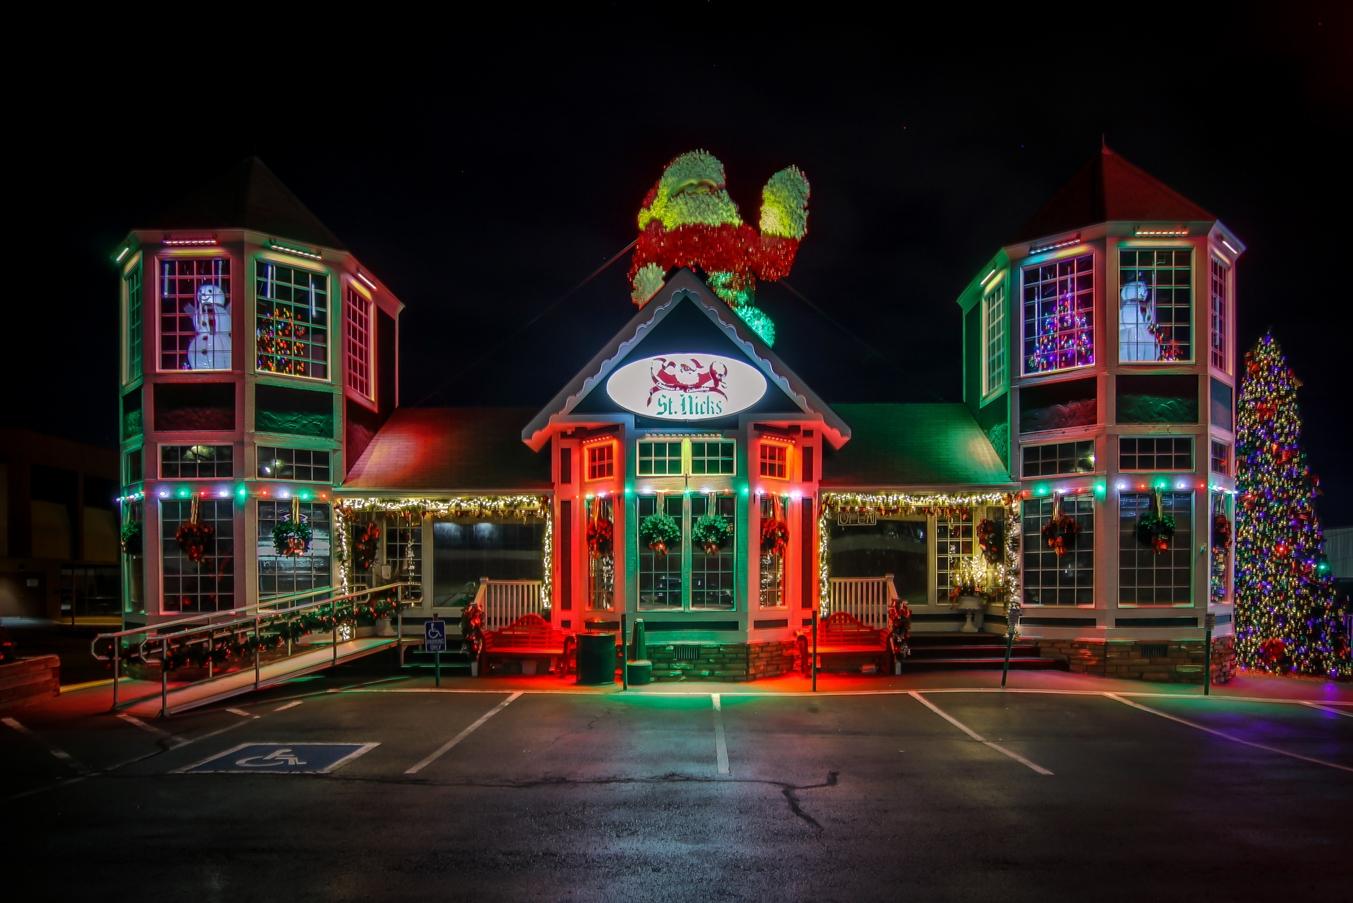 St.Nicks Night Storefront 1 low rez